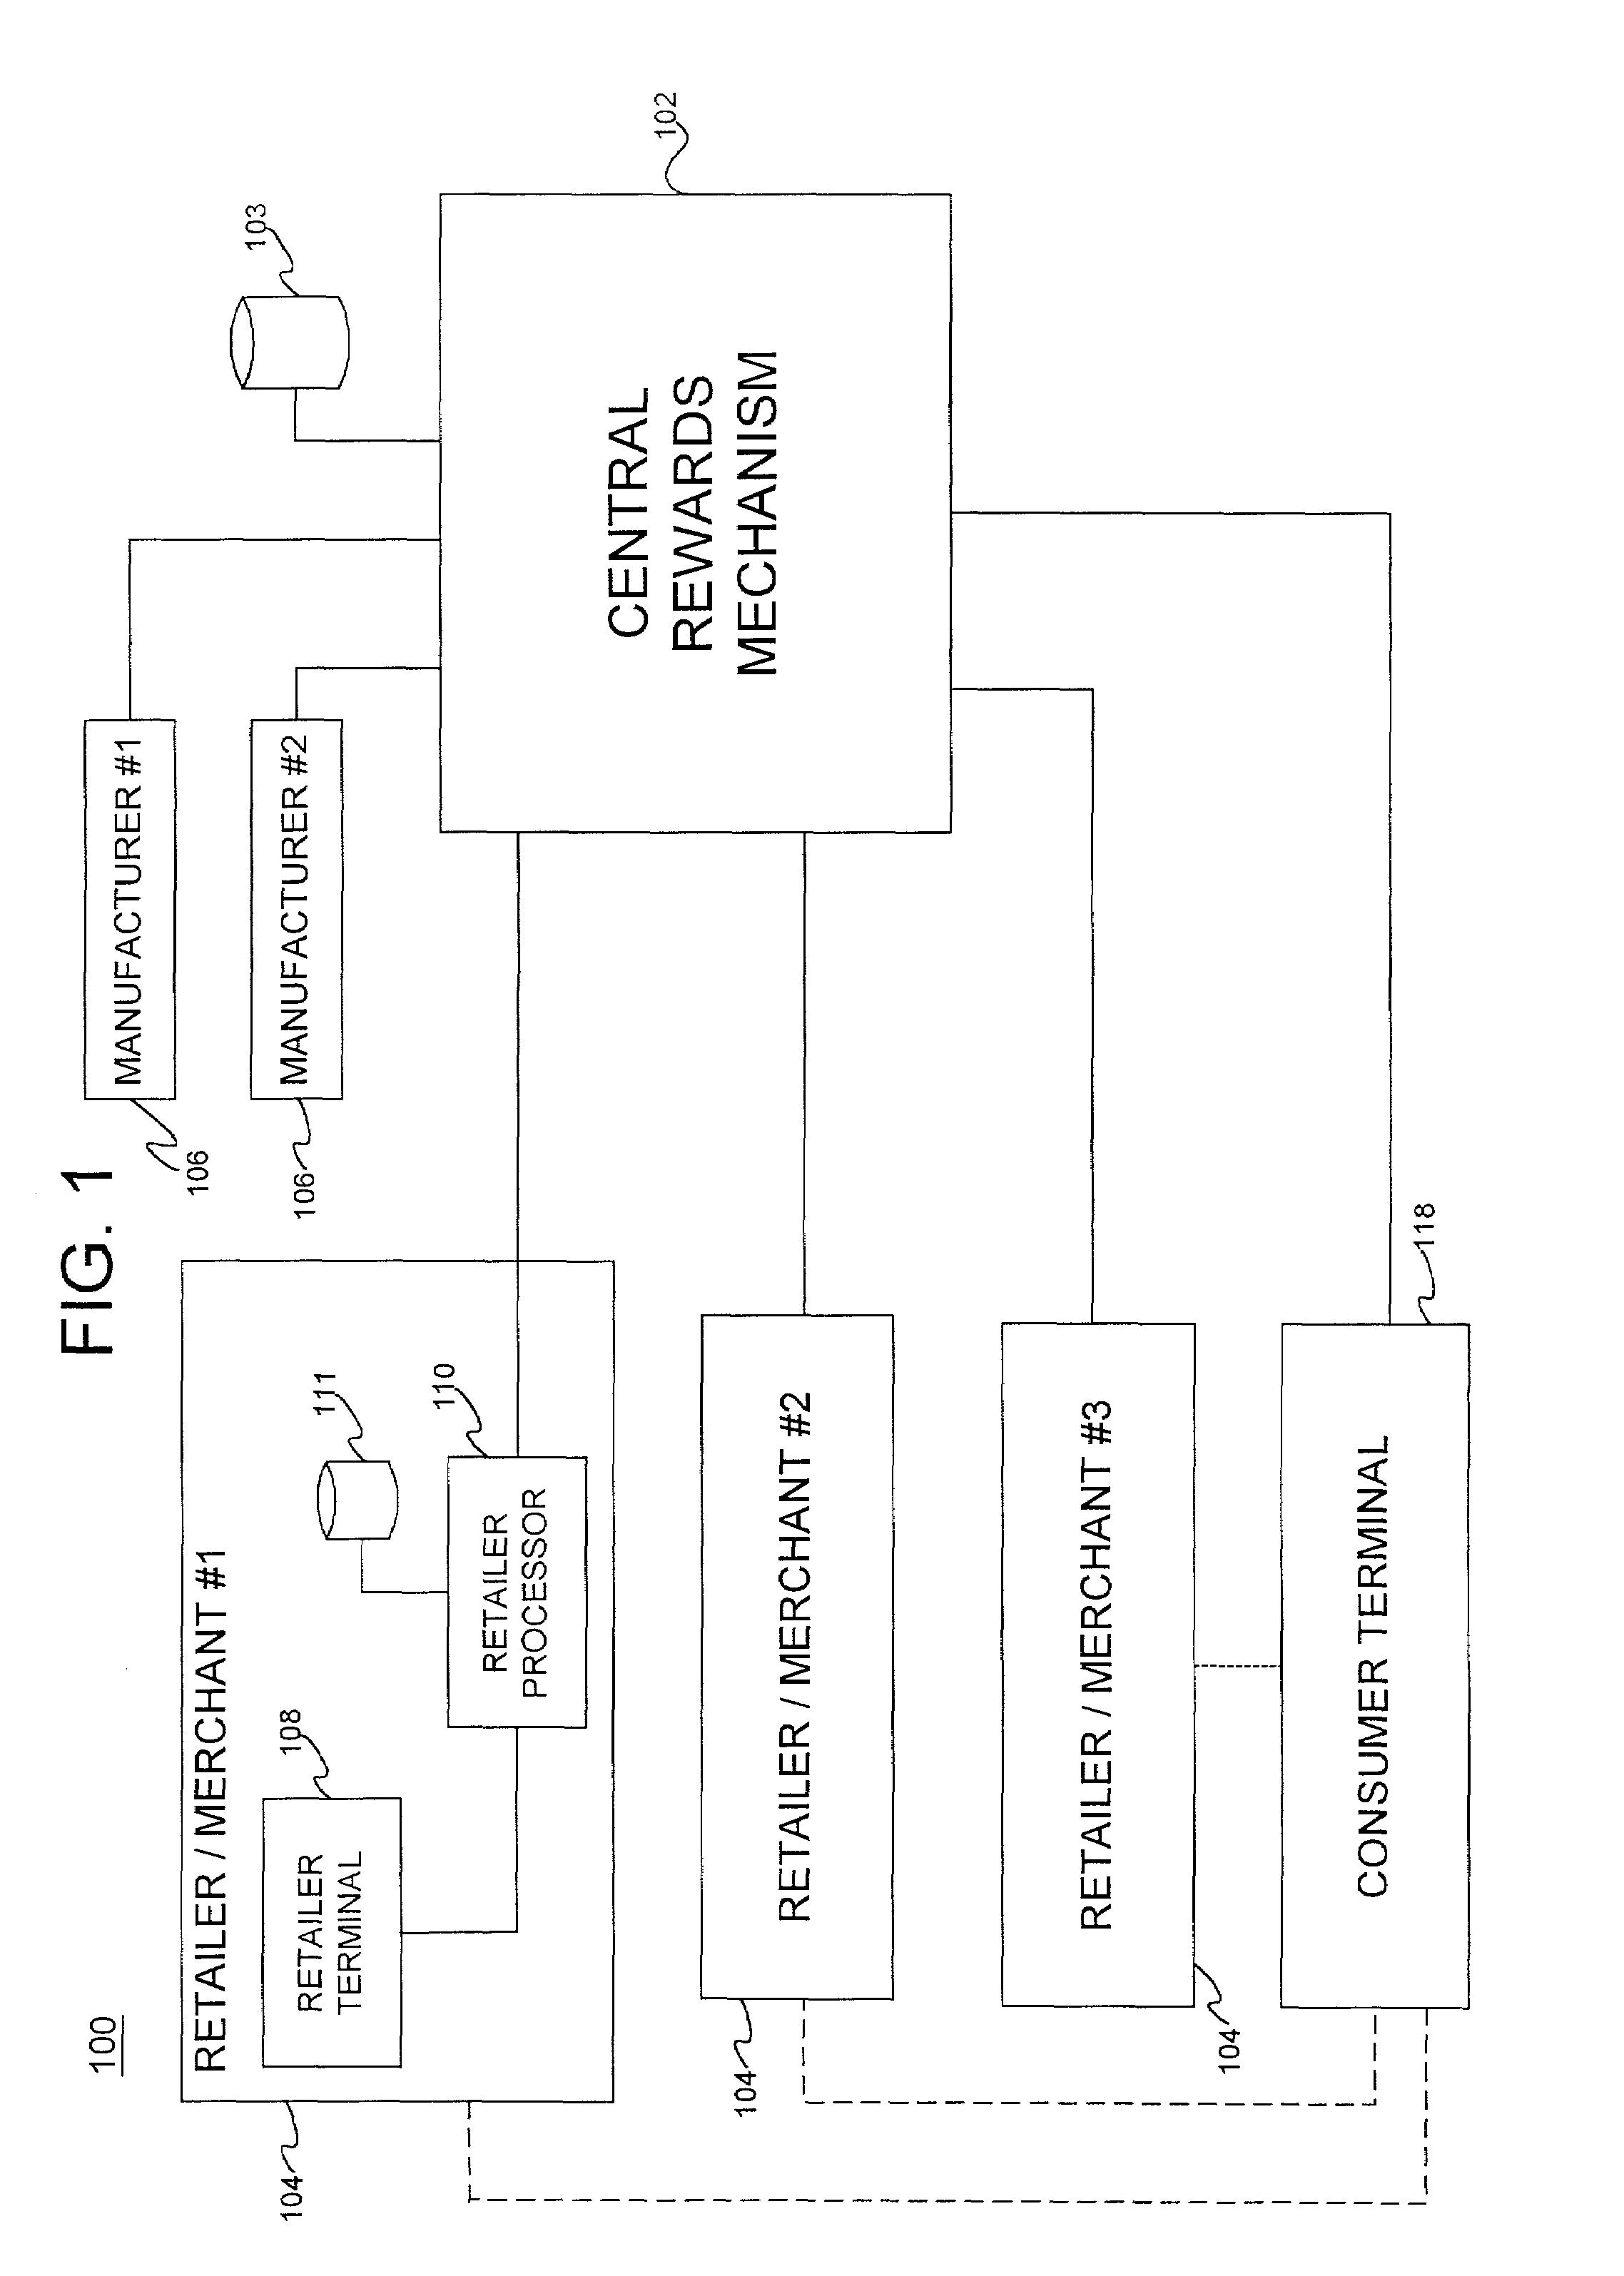 Patent US 7,398,226 B2